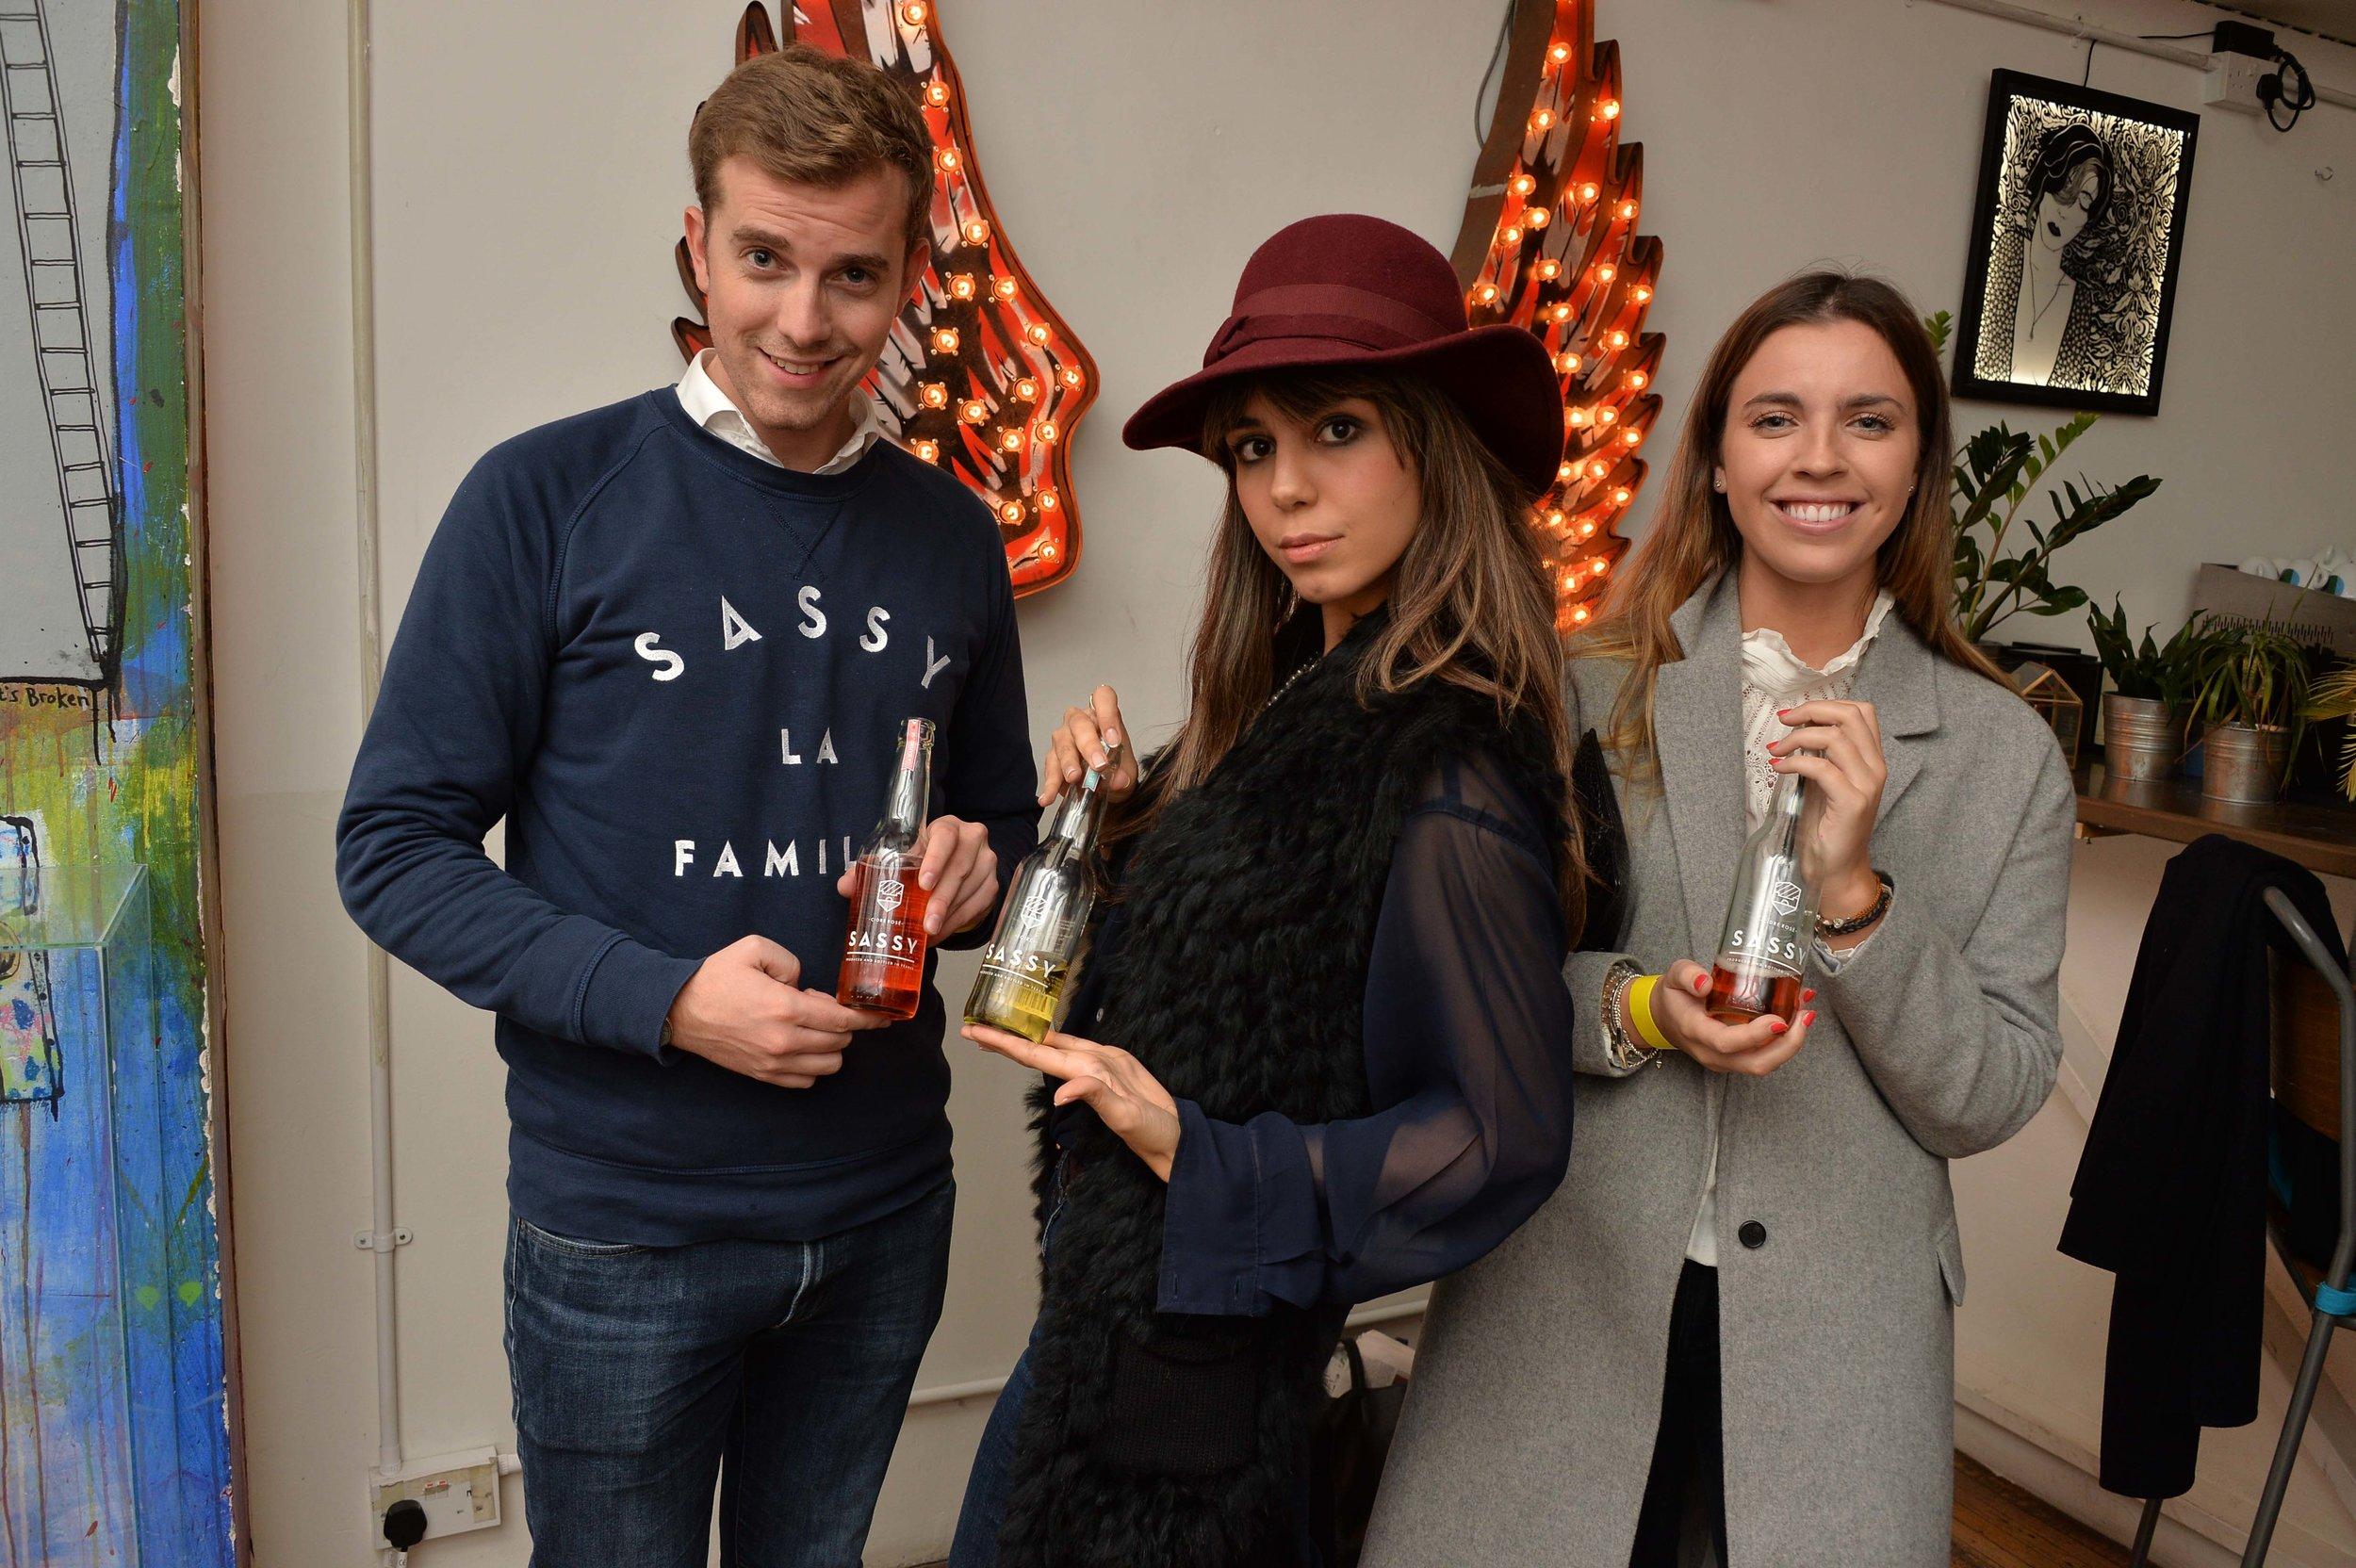 The London Journalist (middle) modelling Sassy Cidre